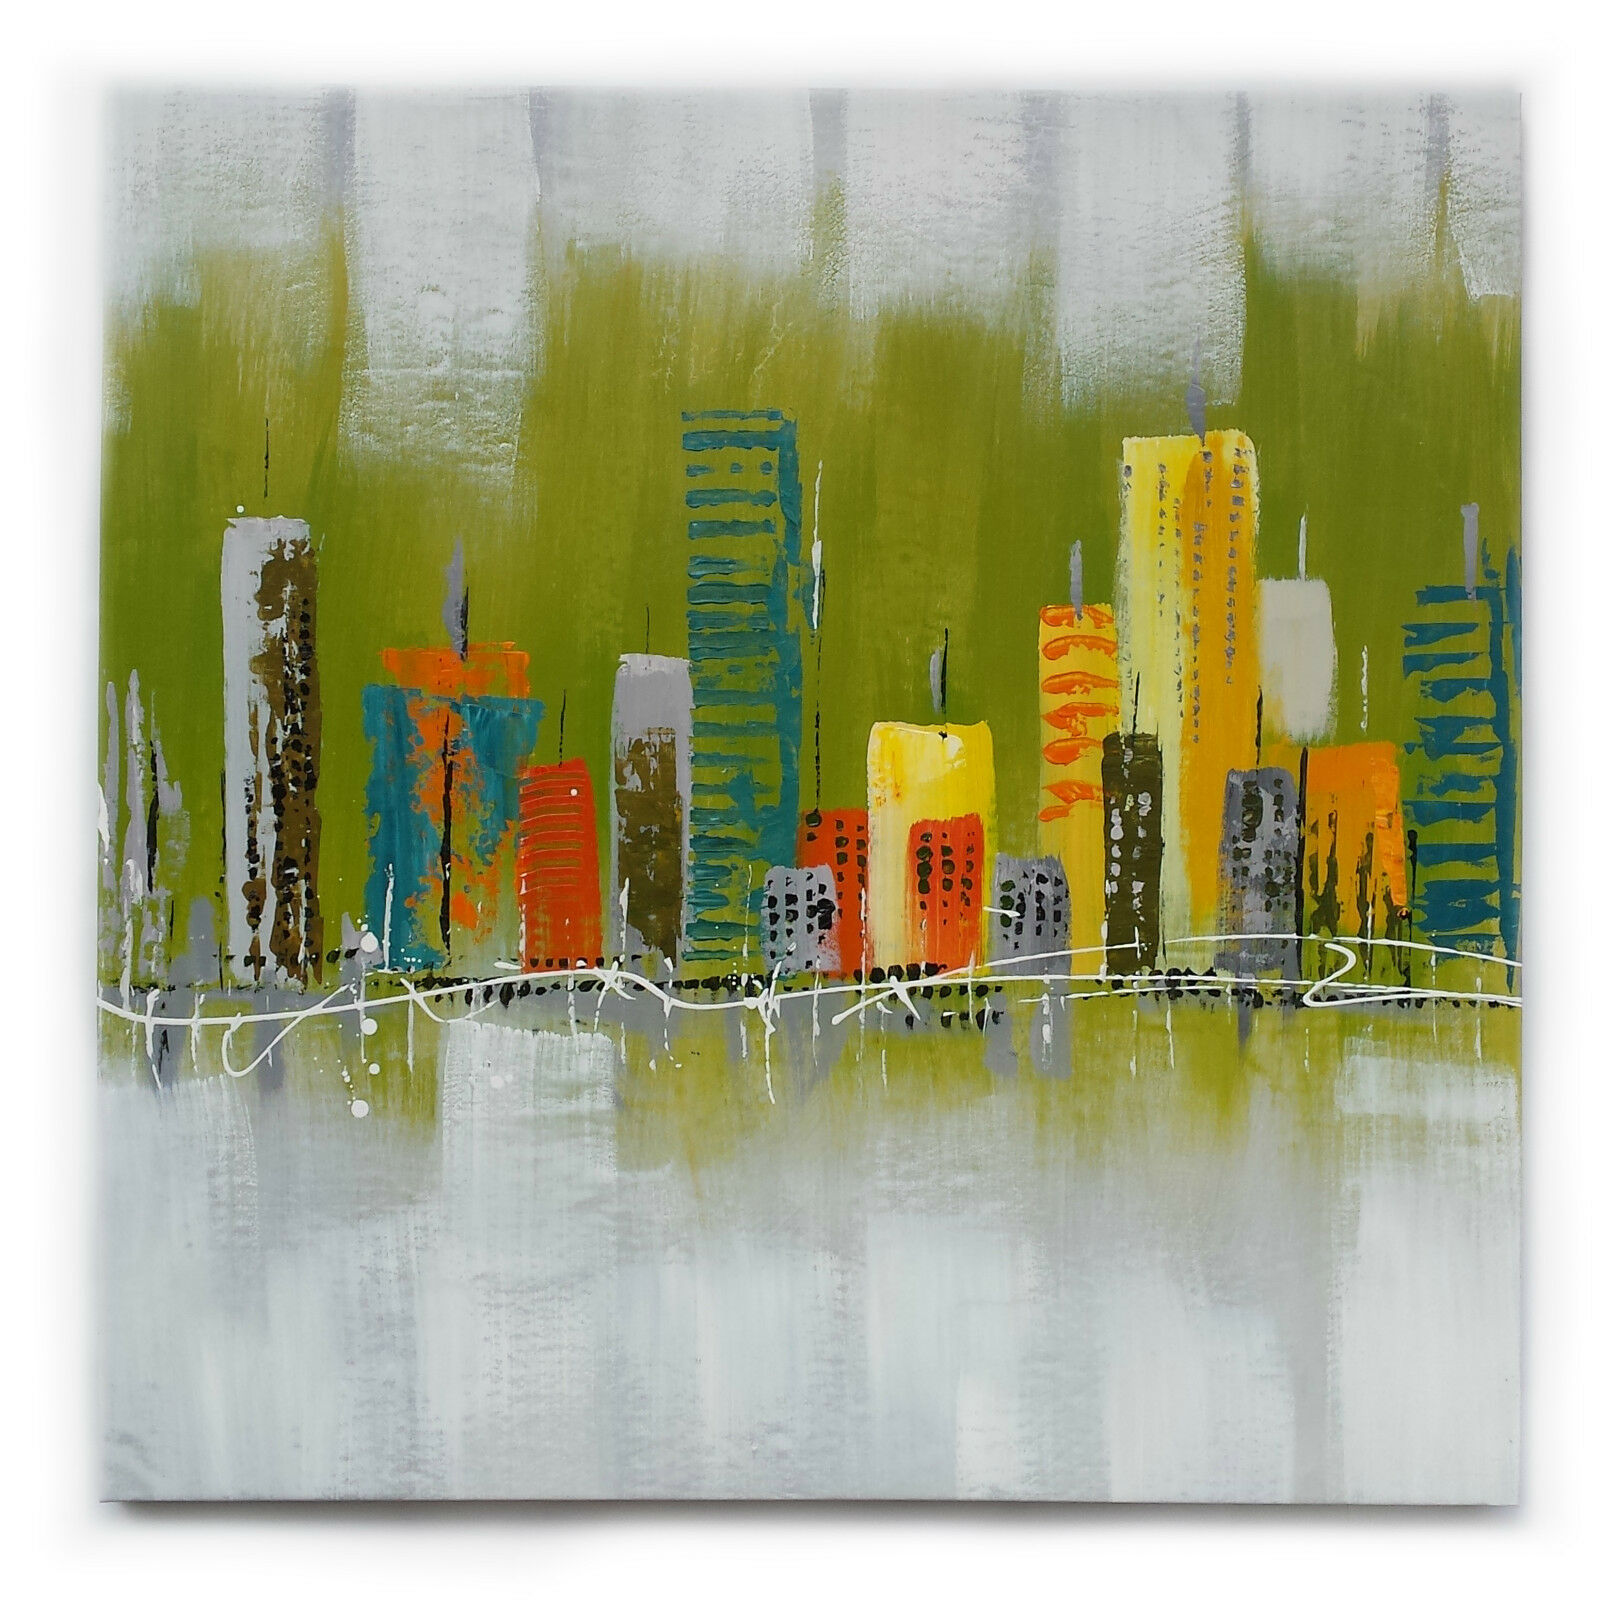 Dipinto Olio su Tela - 80x80 cm - Moderno - Quadro Telaio Città Paesaggio